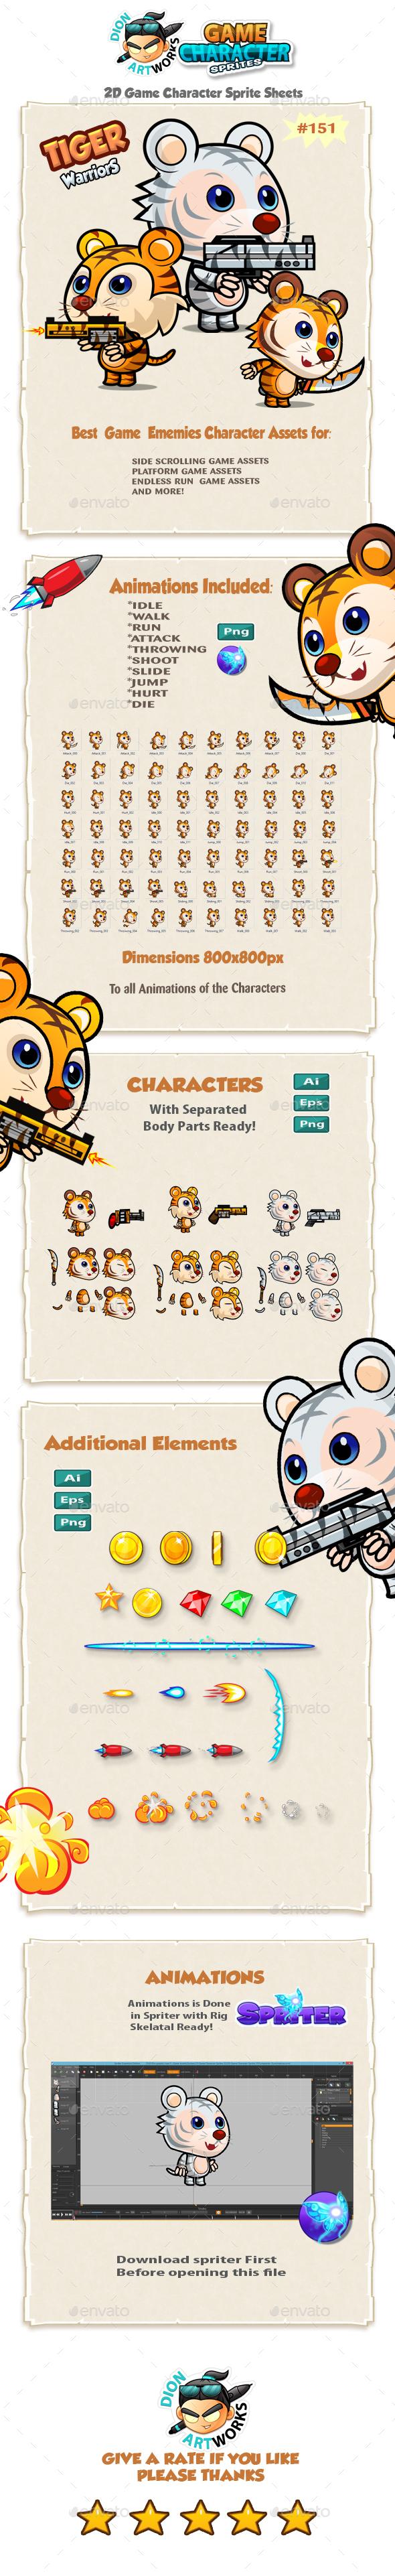 Tiger Warriors 2D Game Character Sprites 151 - Sprites Game Assets